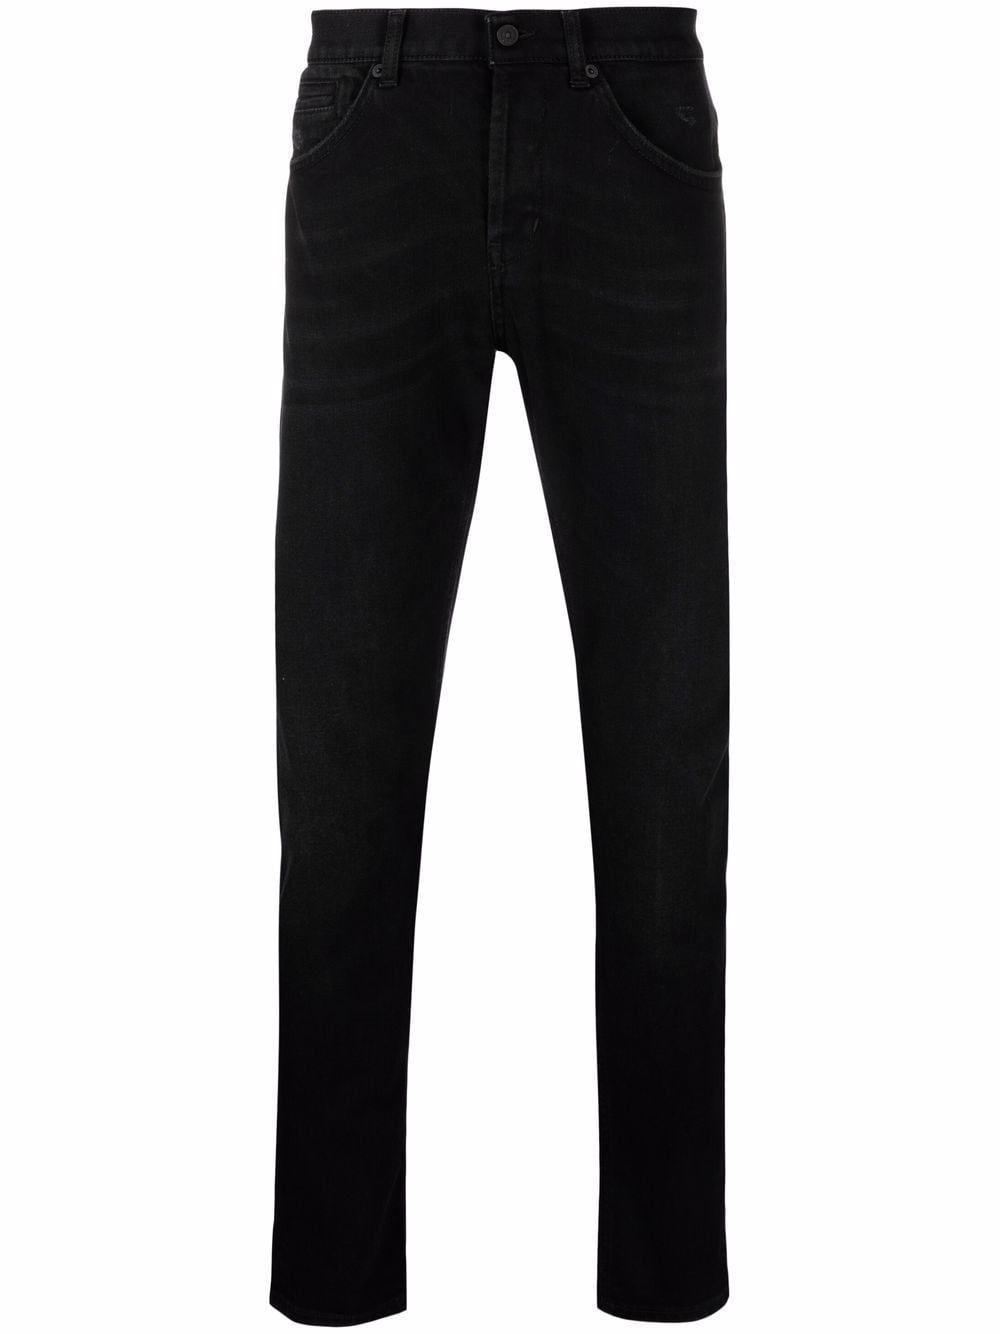 Dondup jeans nero